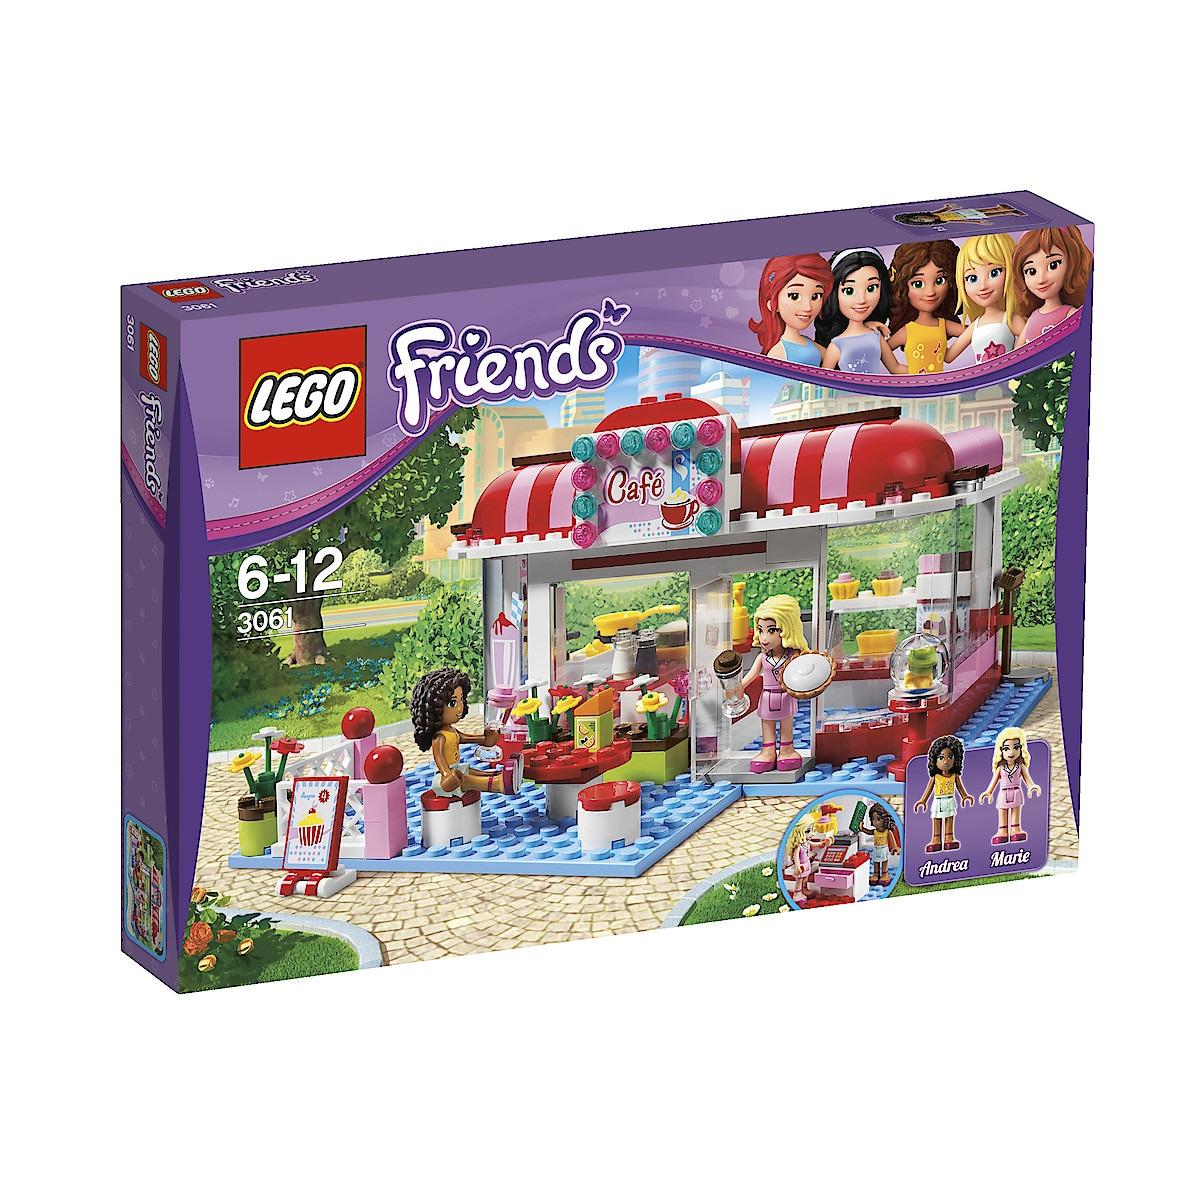 Puistokahvila Lego Friends 3061